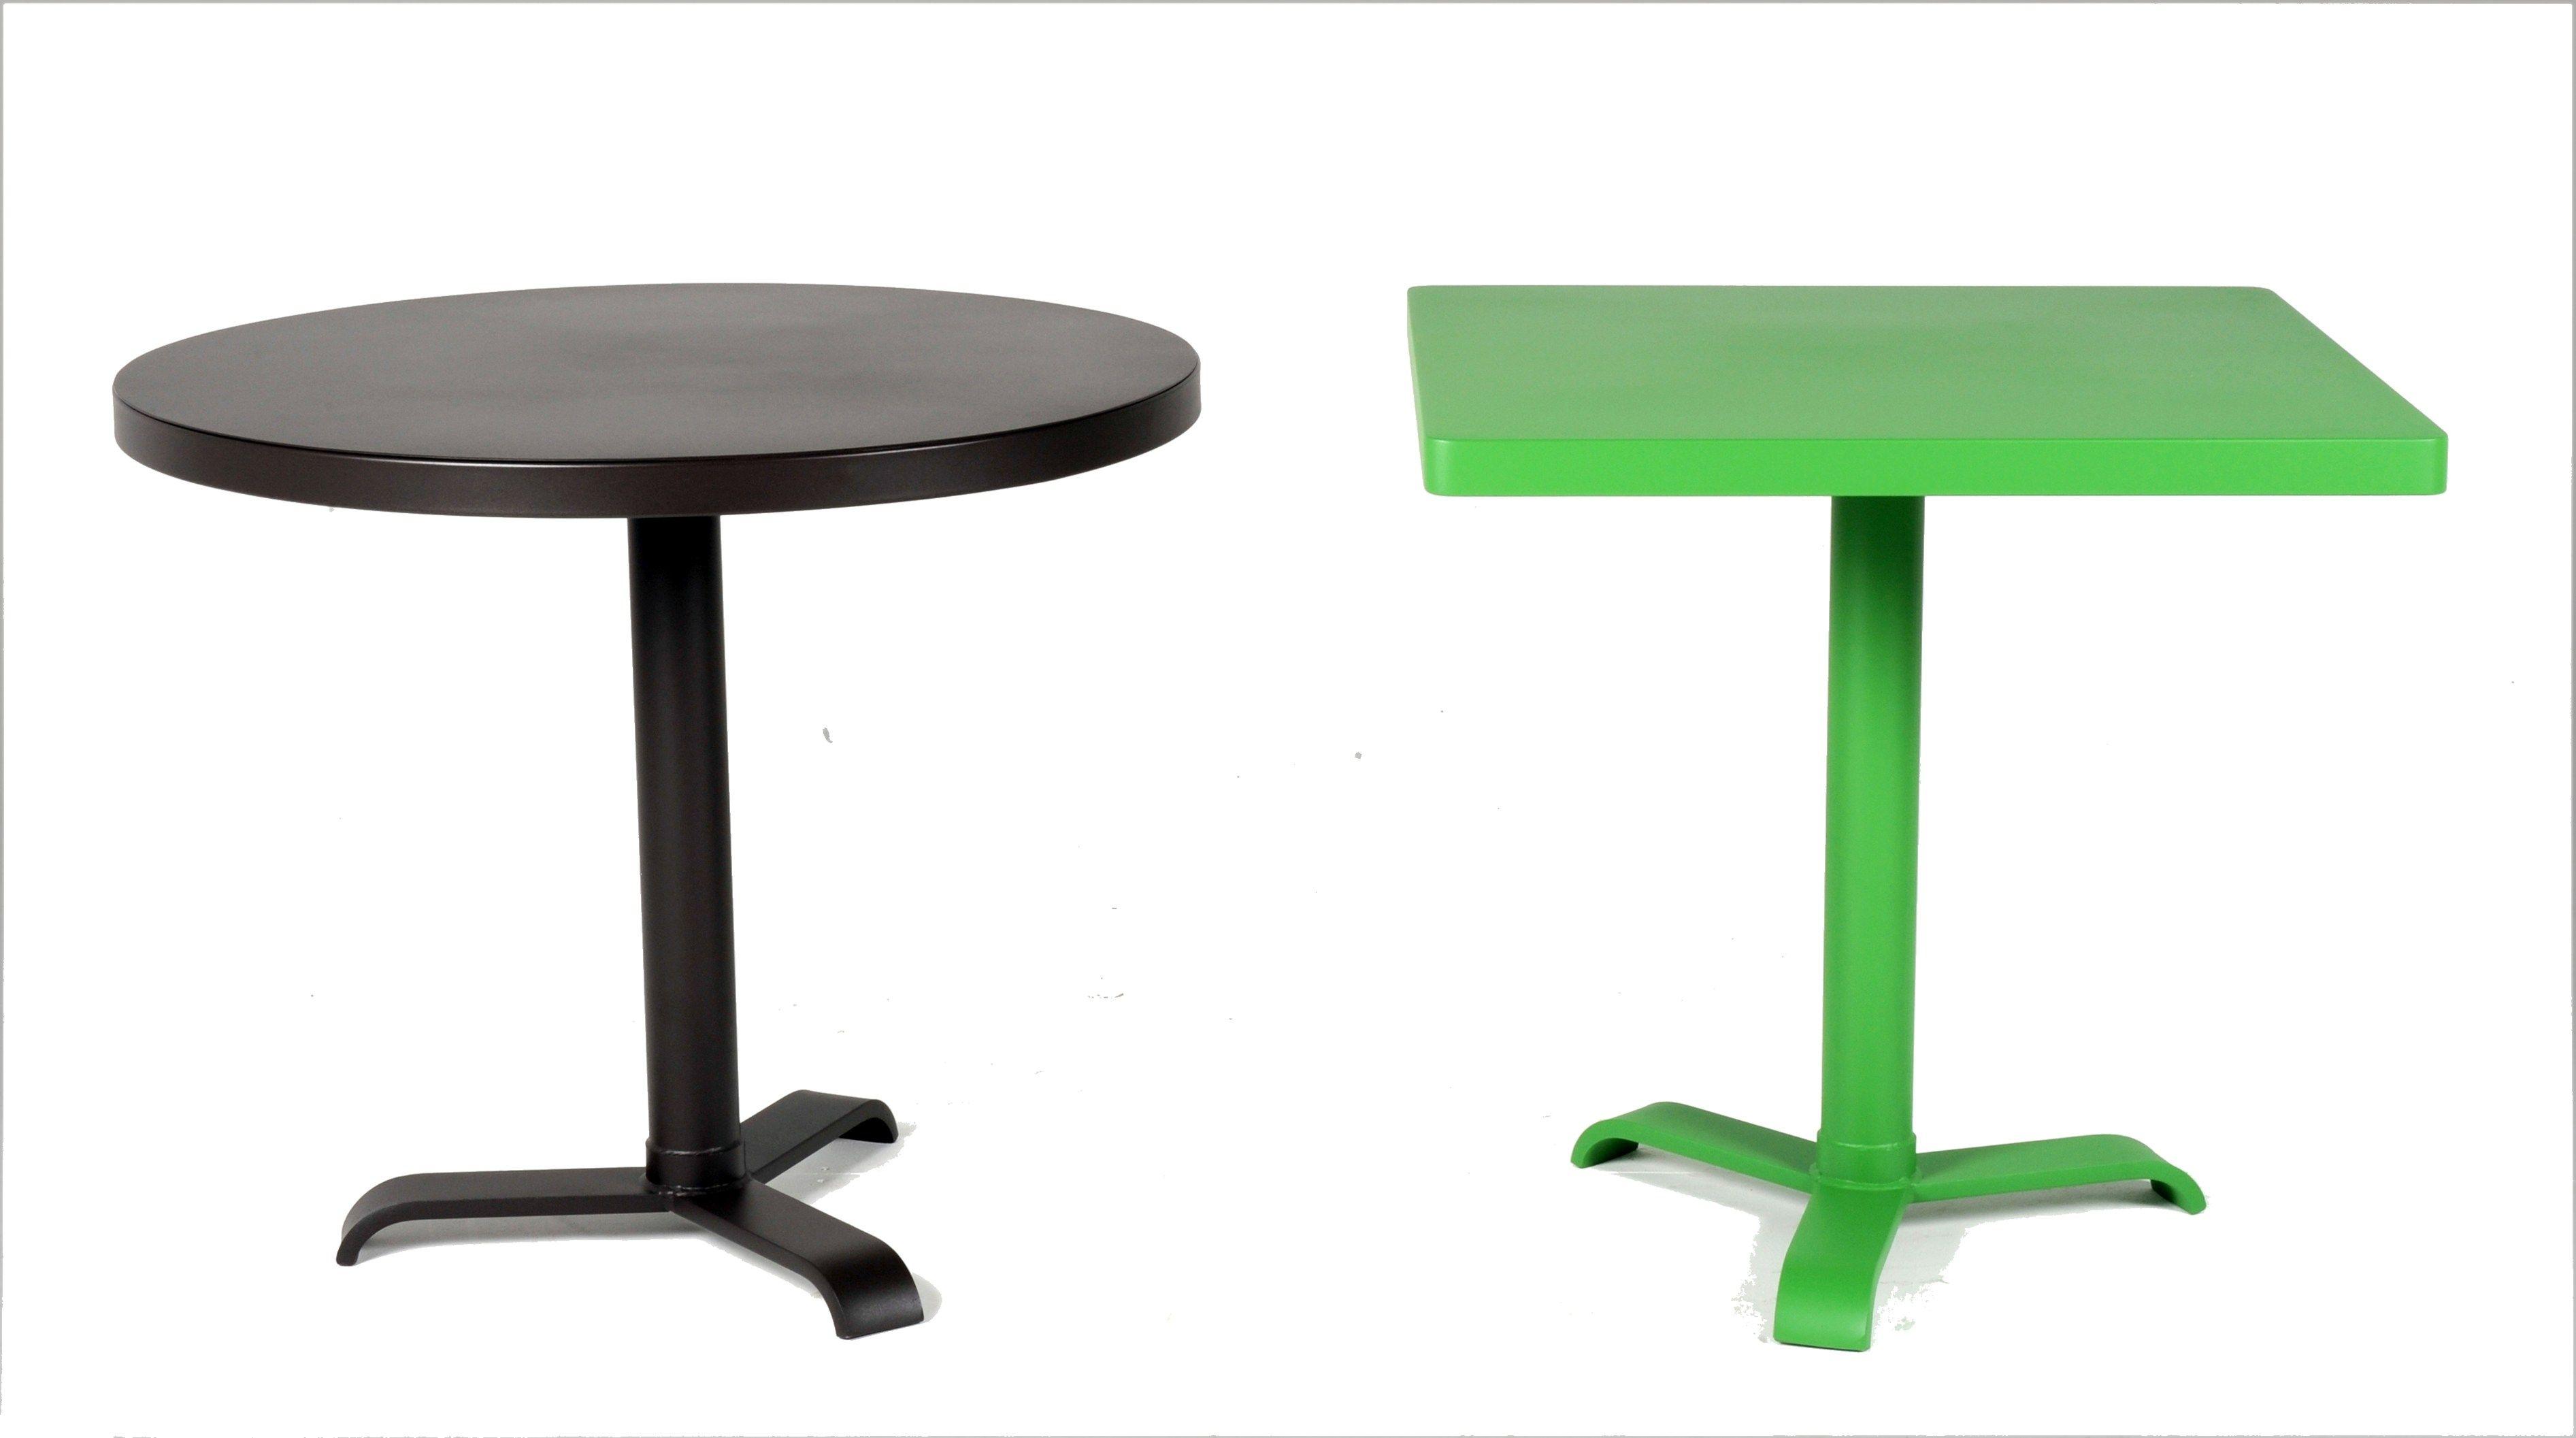 round table 77 by tolix steel design design jean pauchard. Black Bedroom Furniture Sets. Home Design Ideas